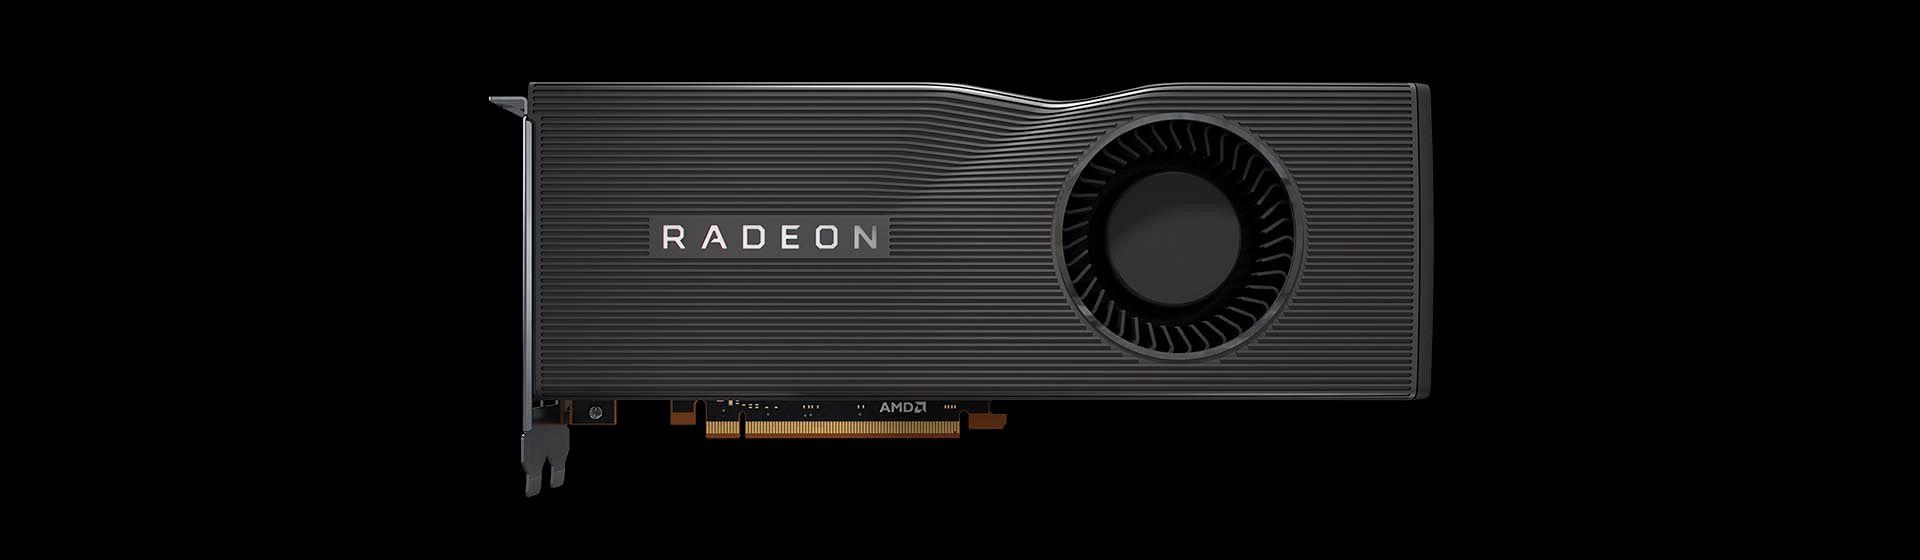 AMD Radeon RX 5700 XT é uma boa GPU? Confira análise completa